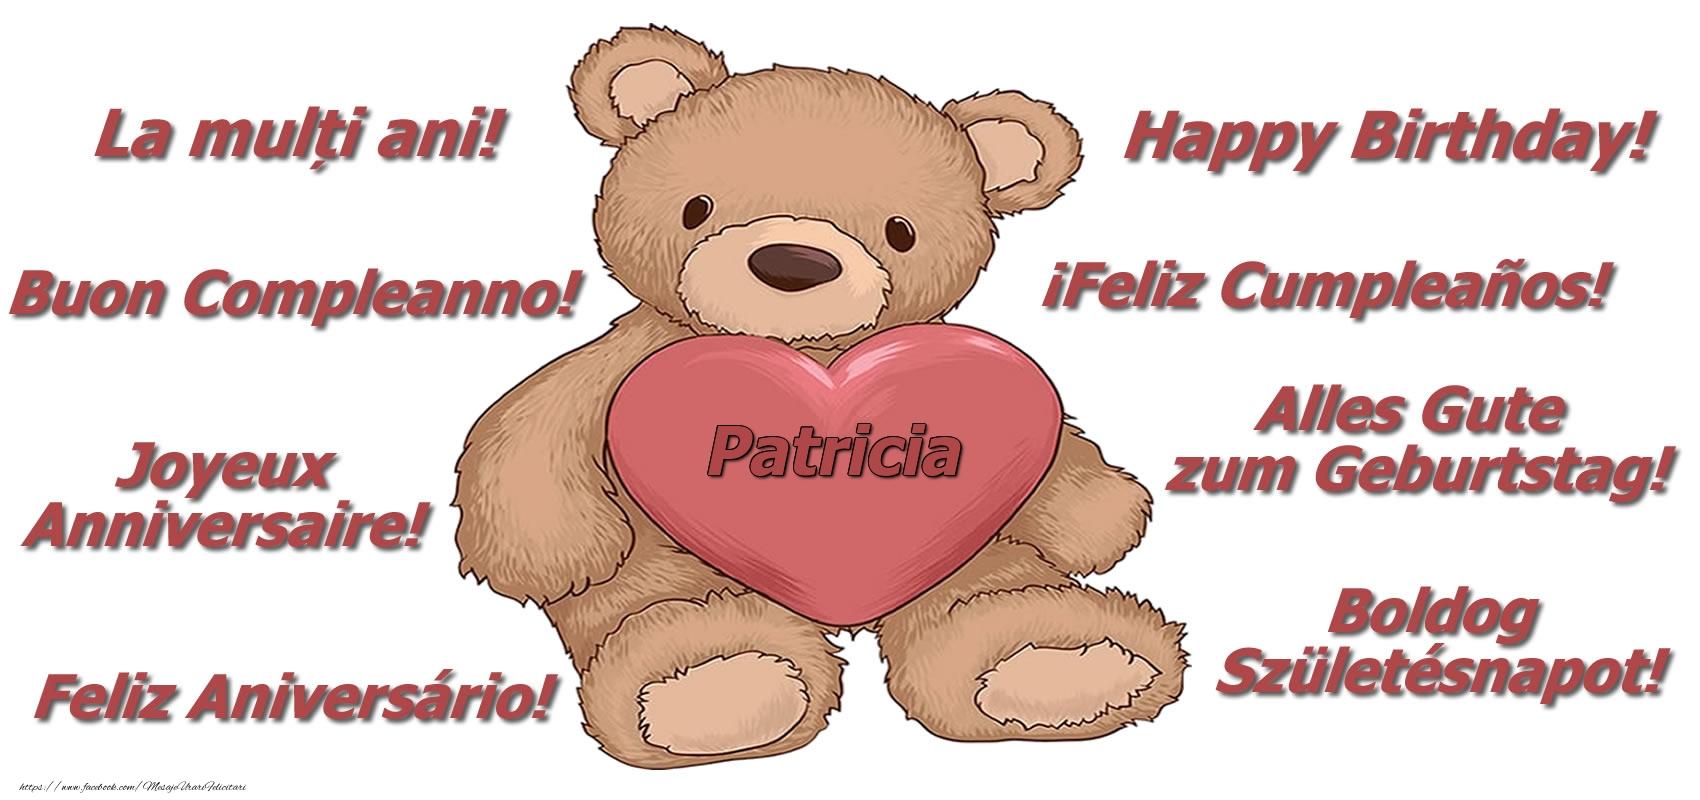 Felicitari de zi de nastere - La multi ani Patricia! - Ursulet